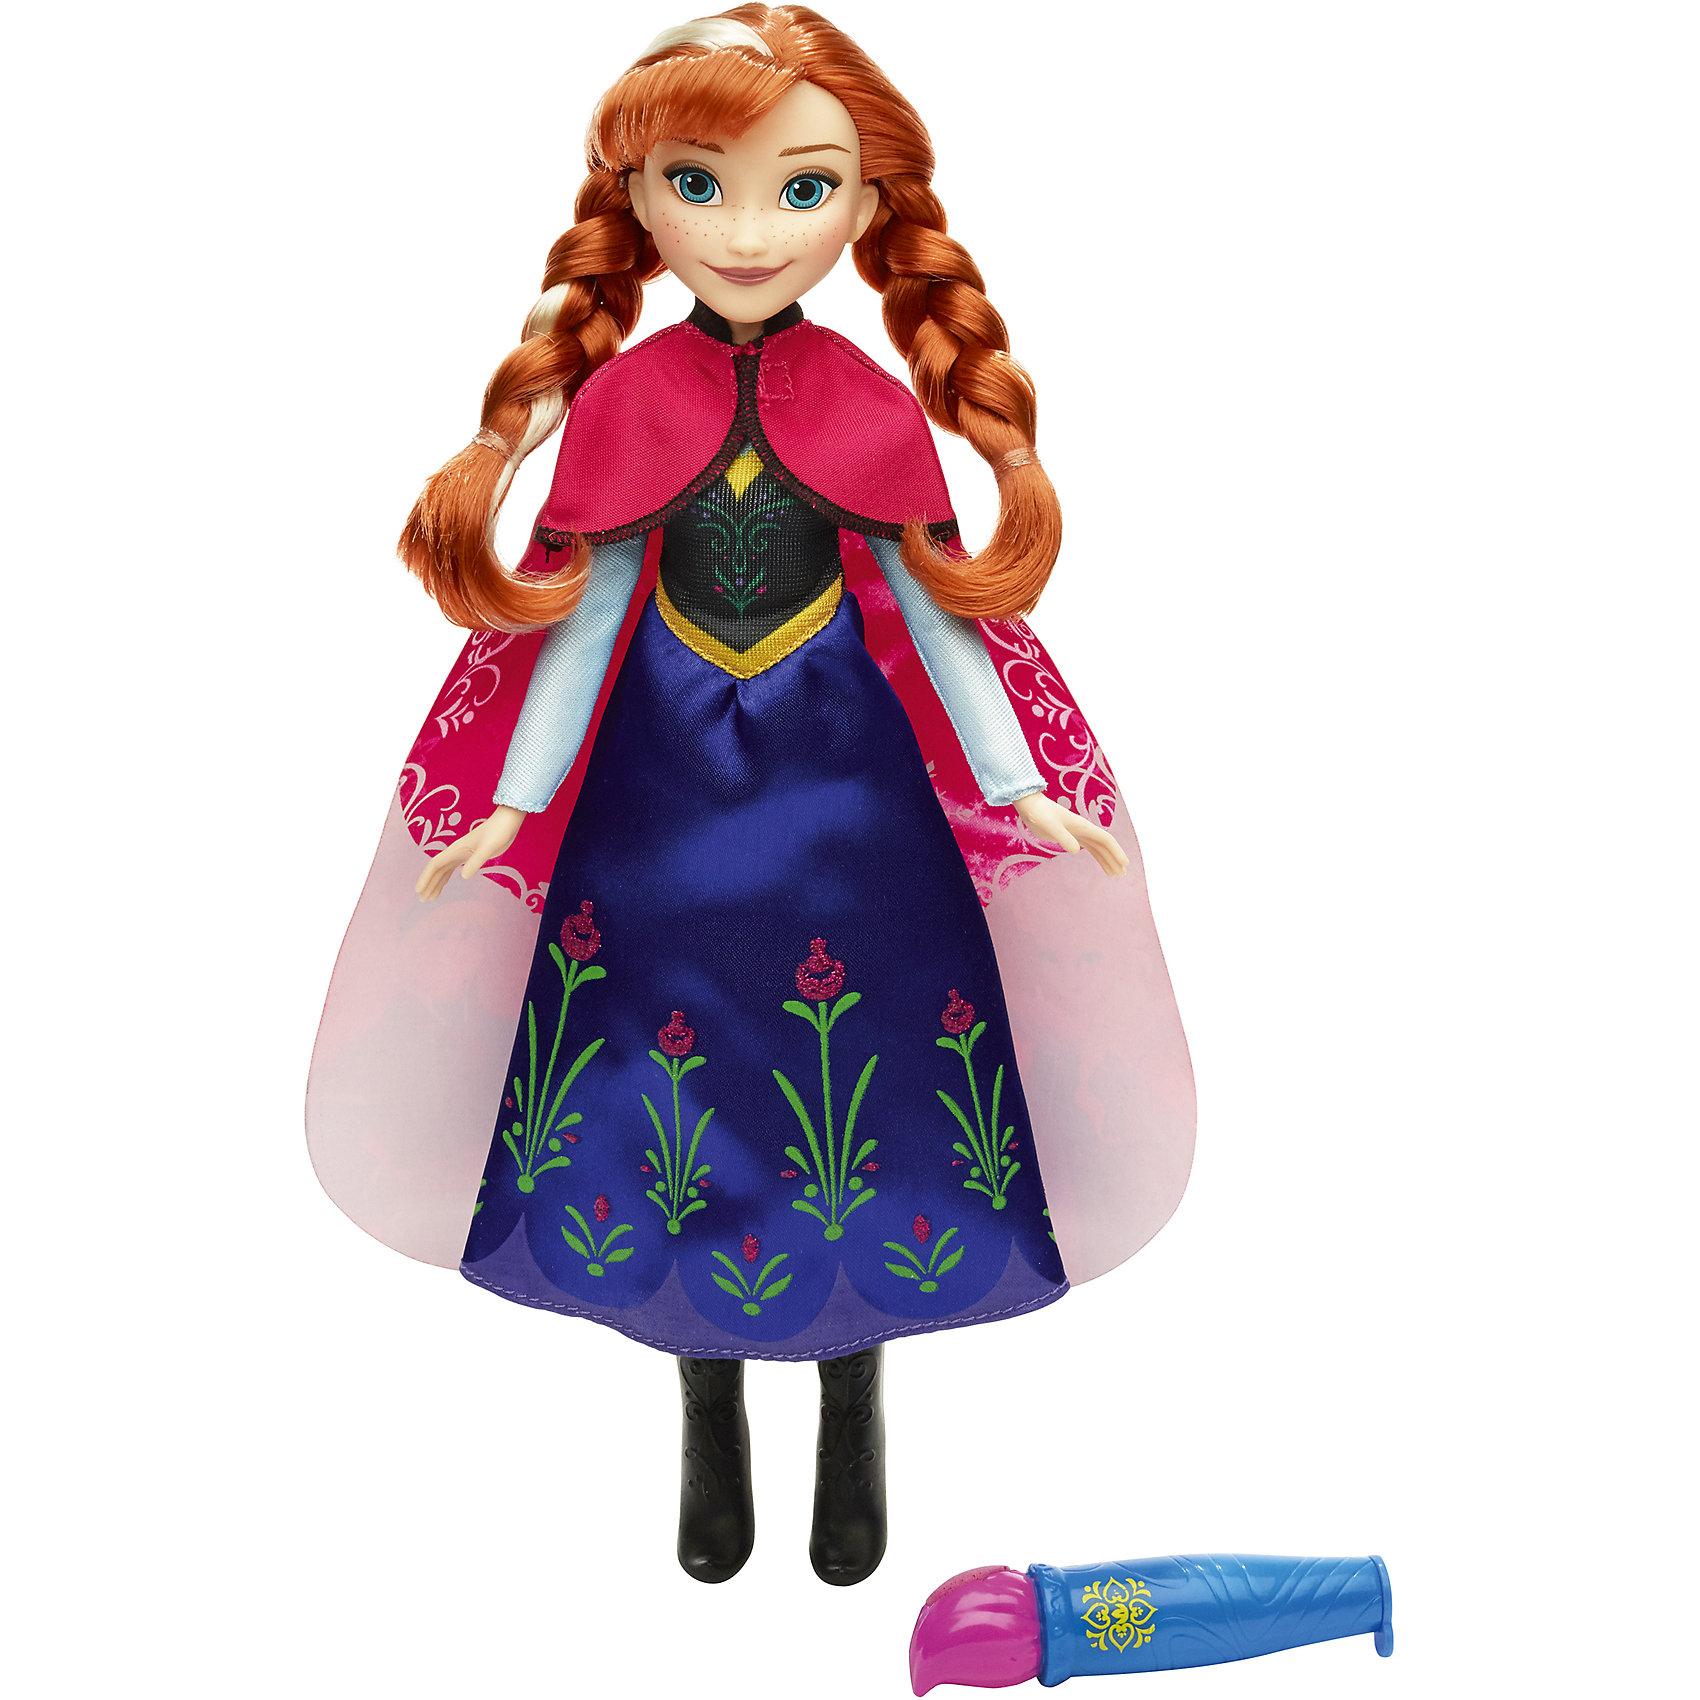 Hasbro Кукла Анна в наряде с проявляющимся рисунком, Холодное Сердце hasbro кукла золушка с проявляющимся принтом